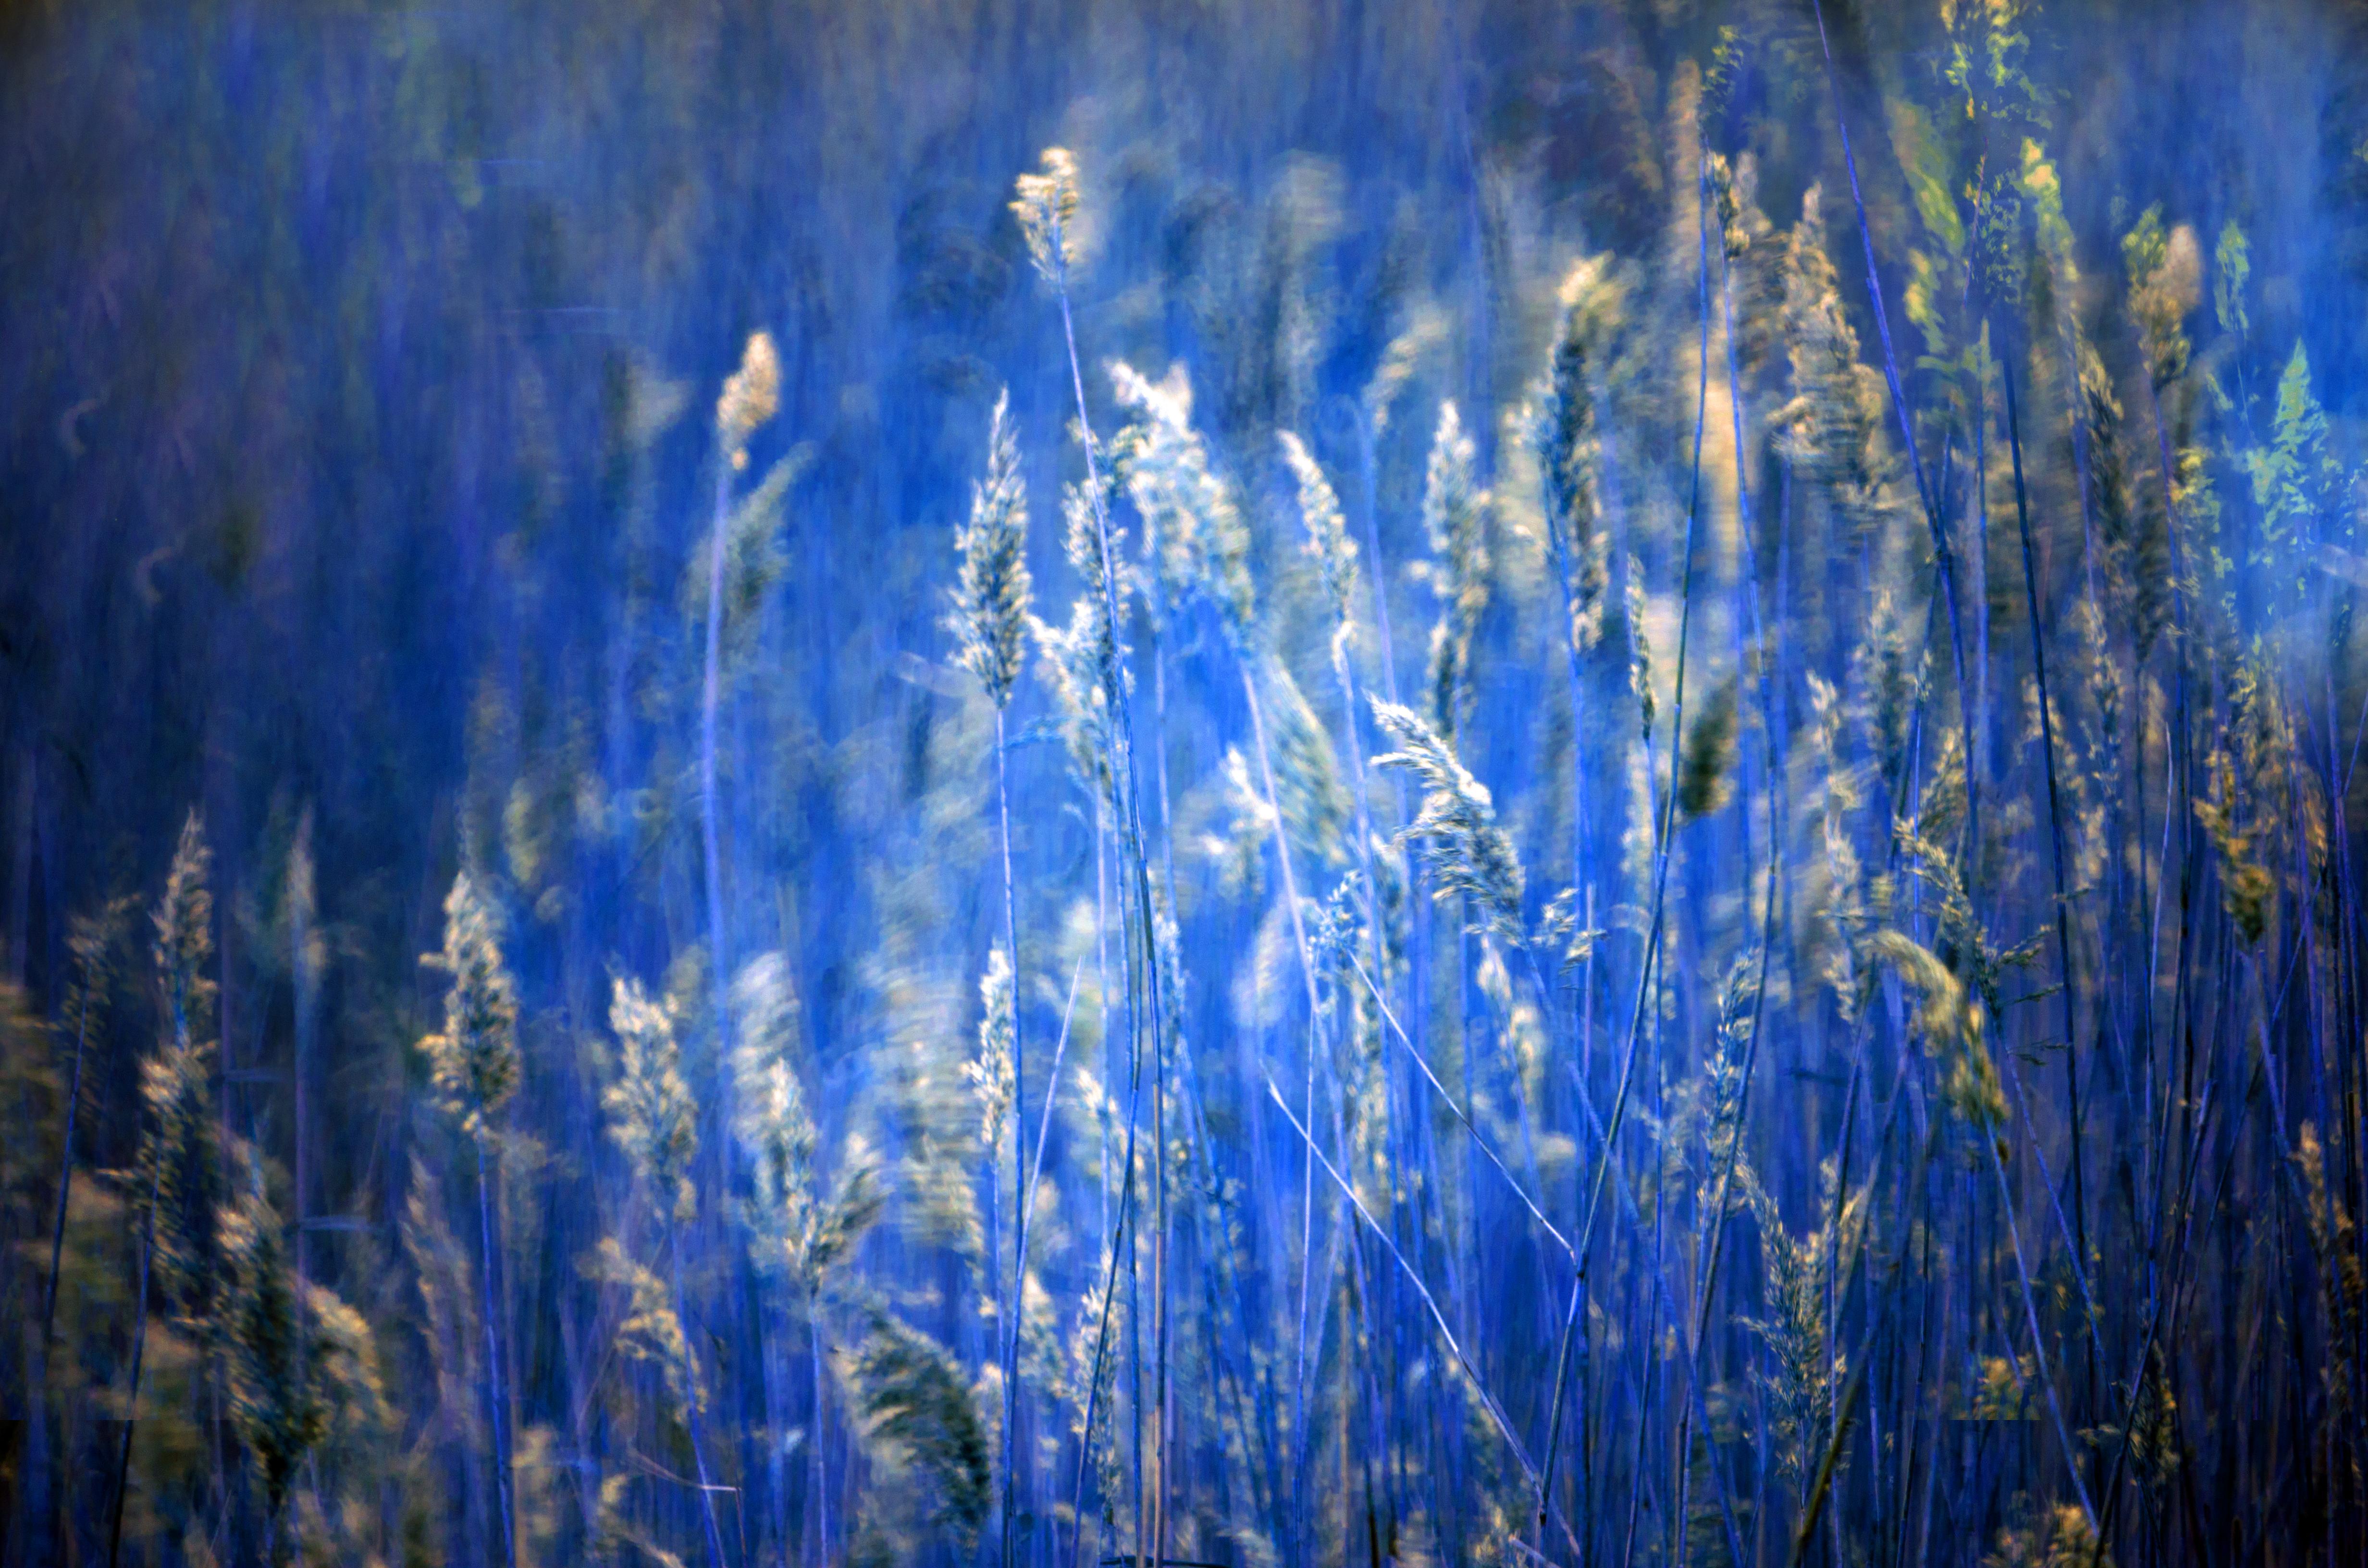 Bleu hour fotografie van Willem Jacobs